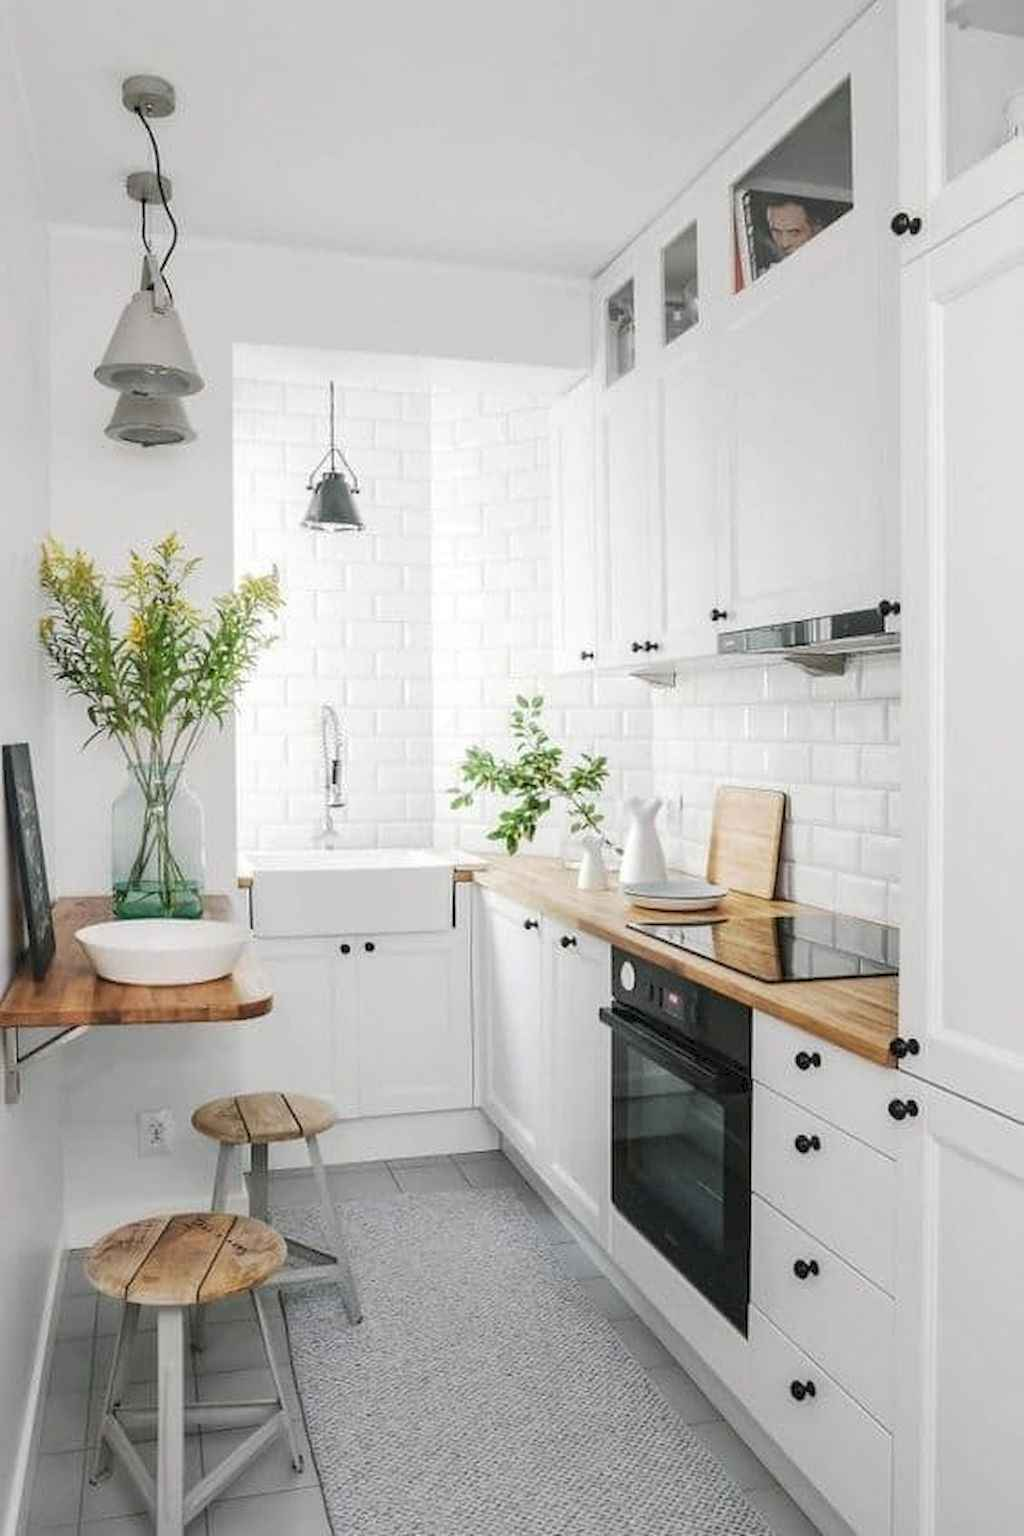 Small apartment decorating ideas (15)